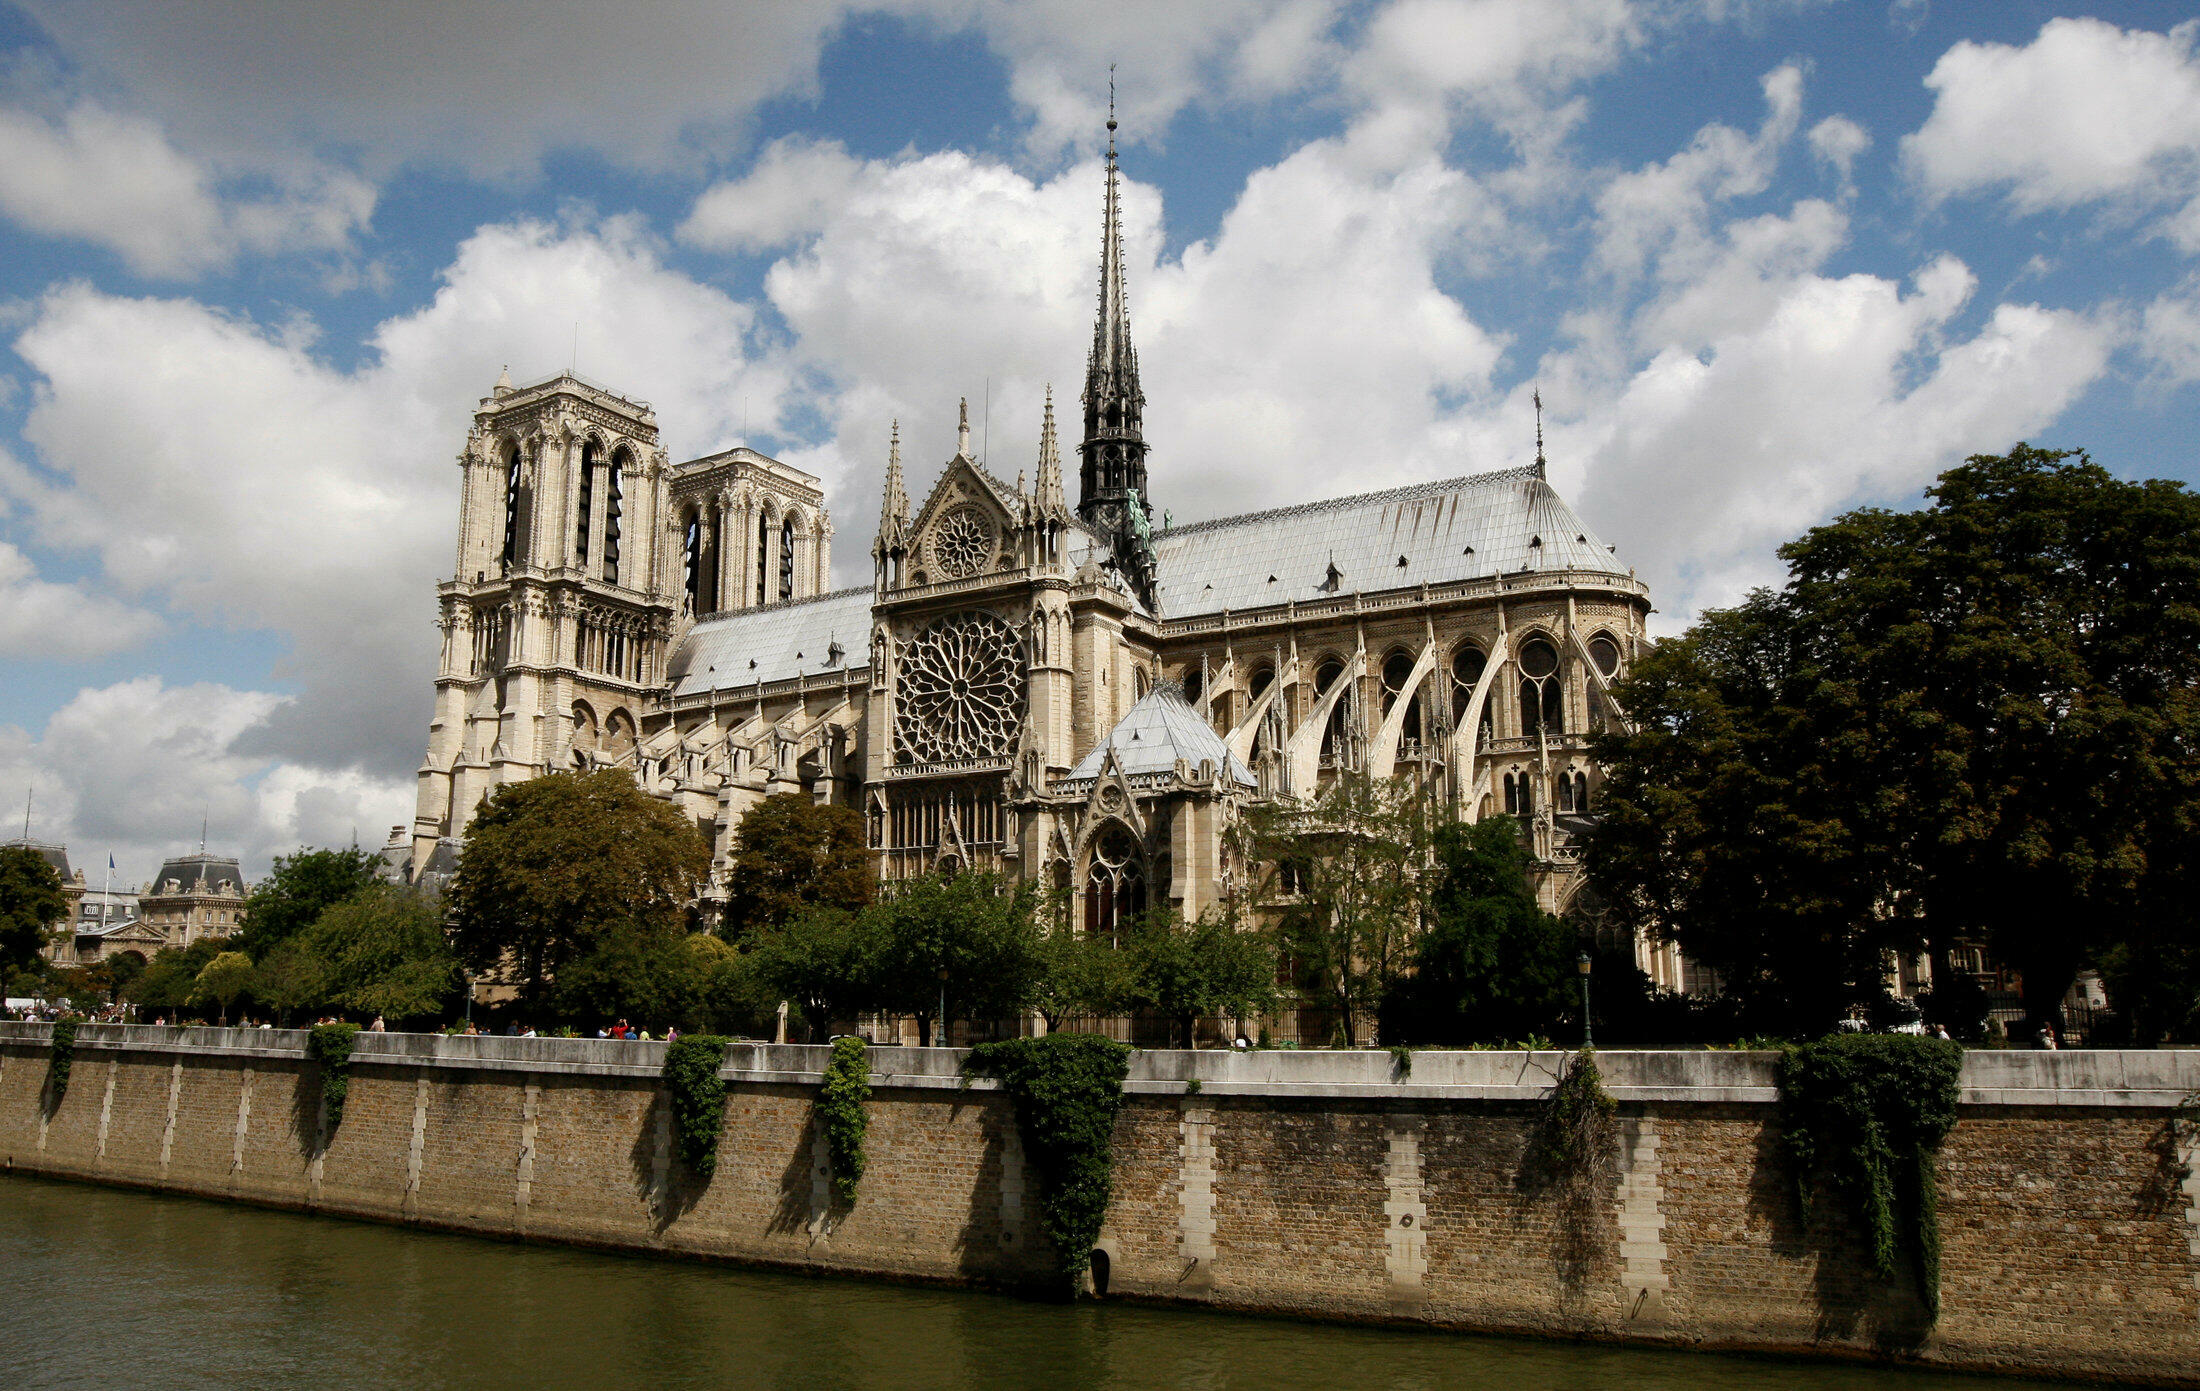 La catedral Notre Dame de París en 2009.